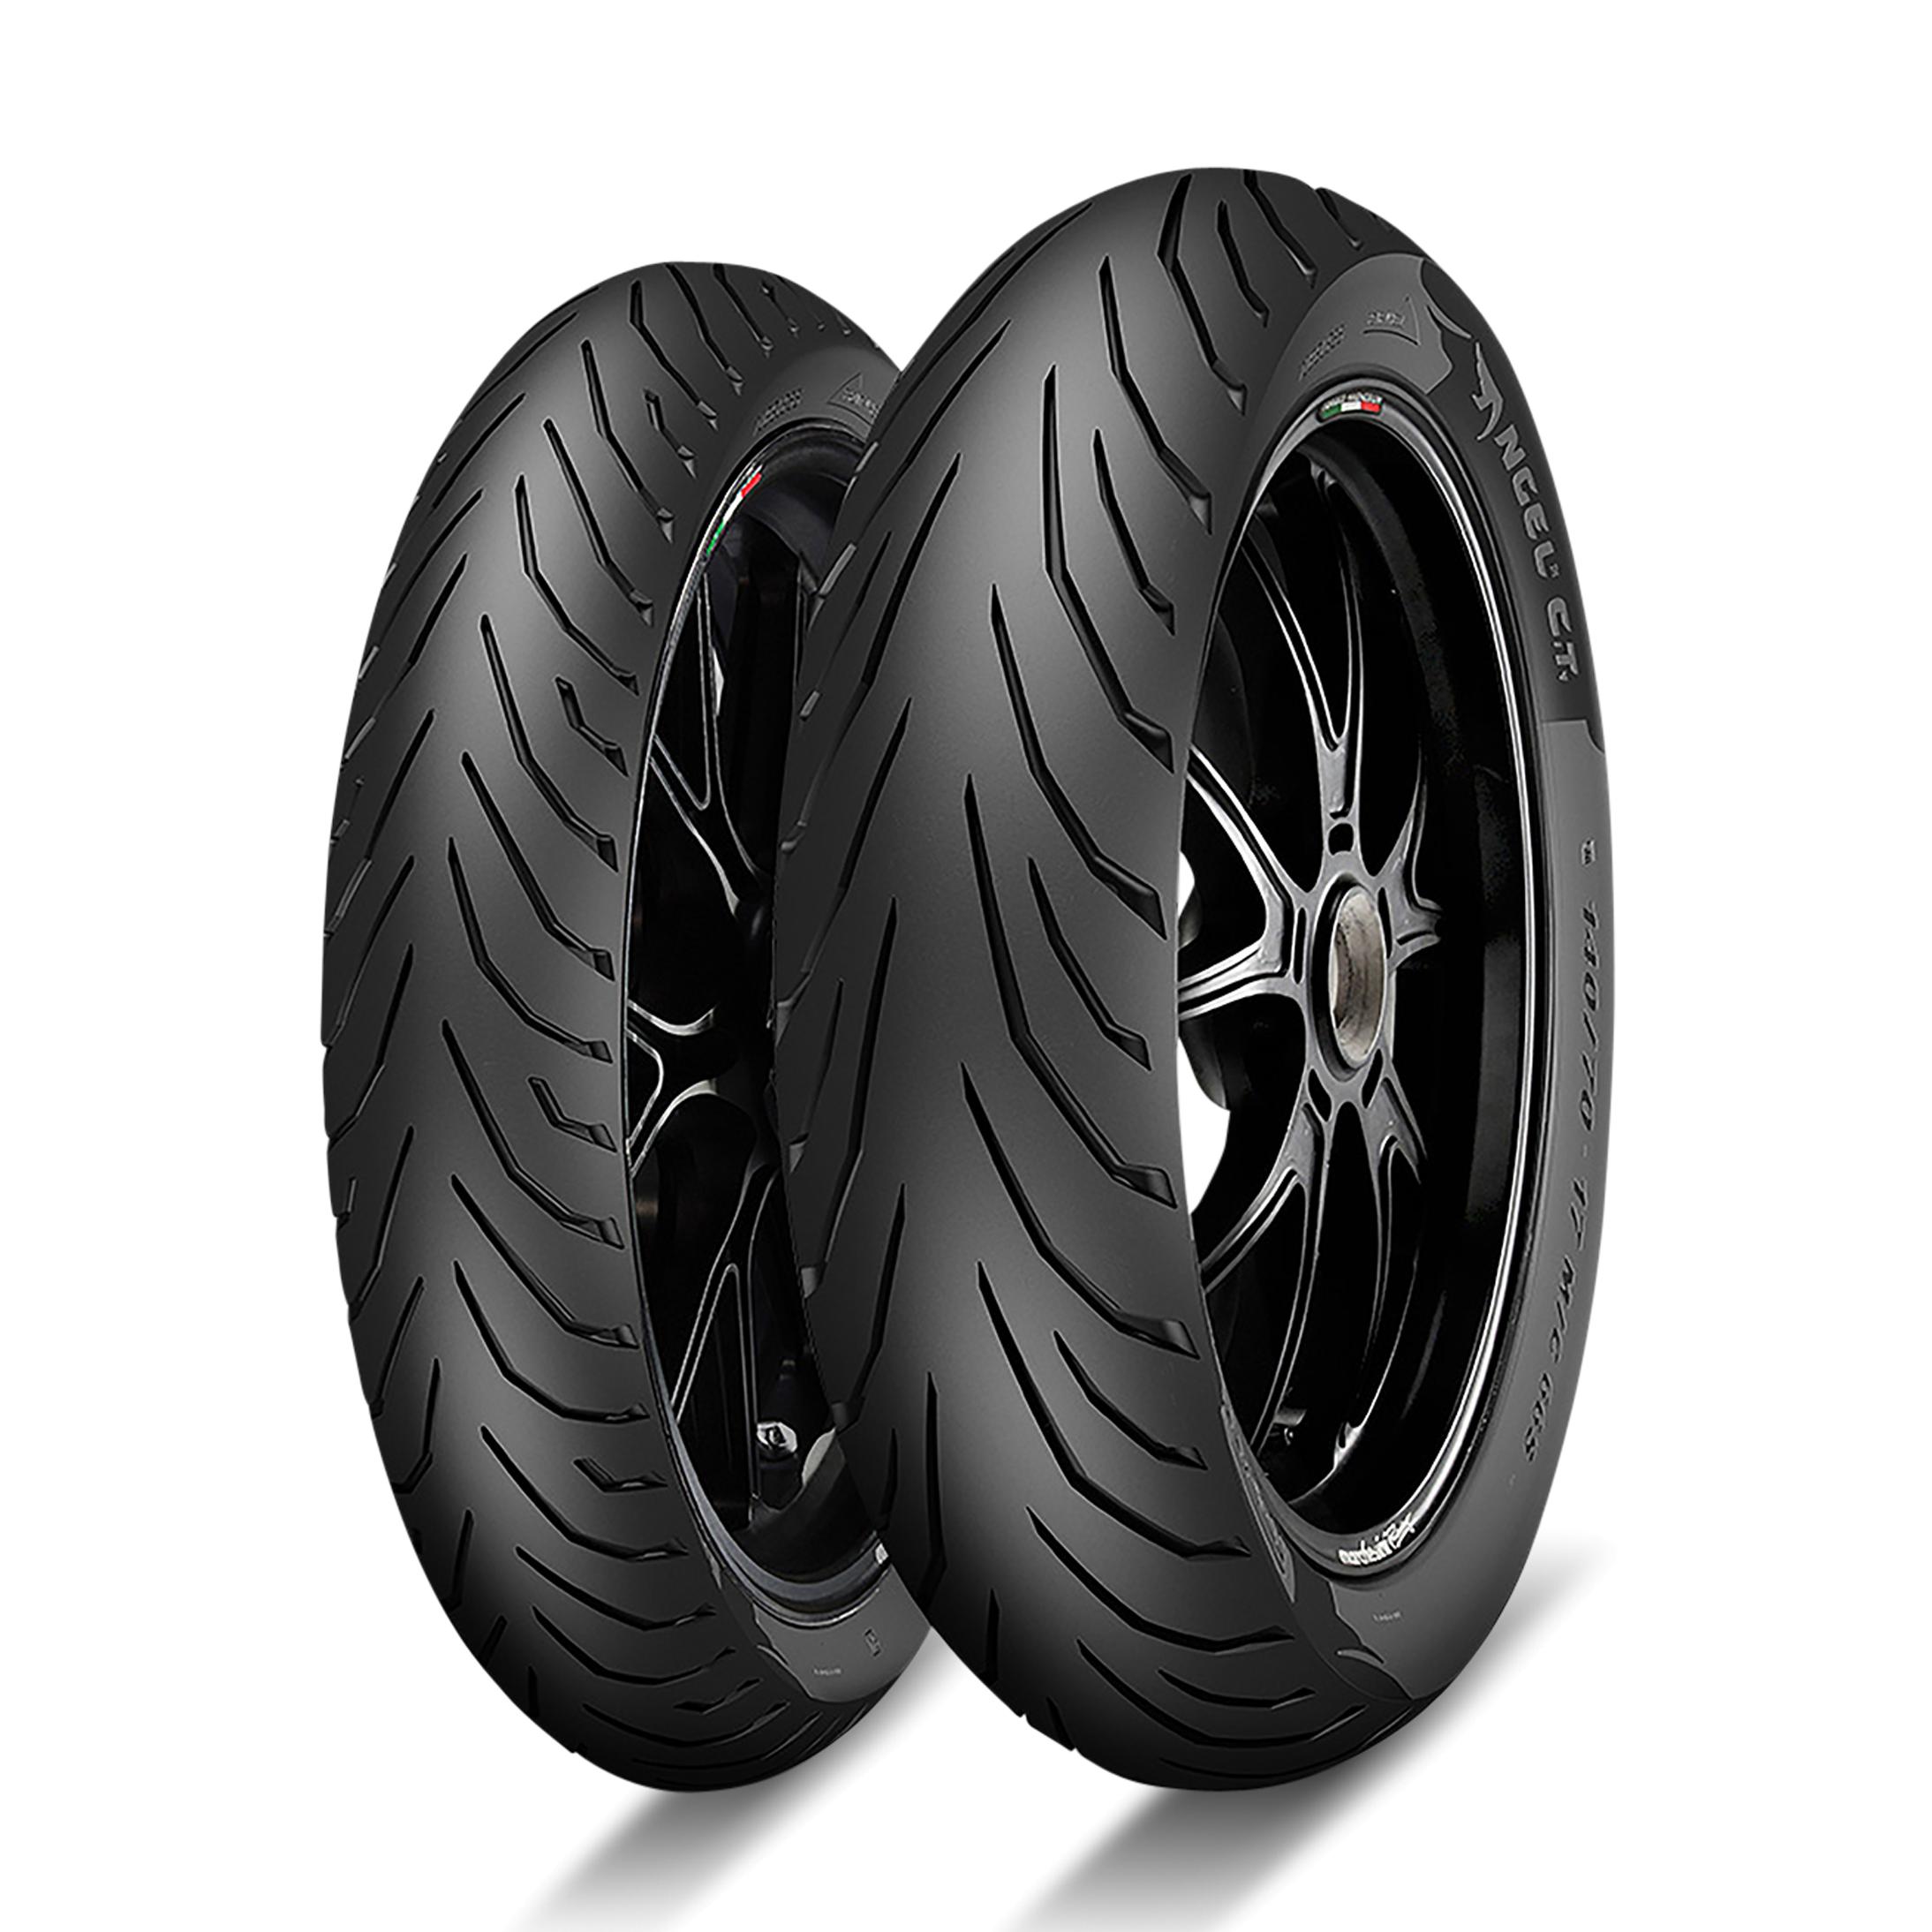 Pirelli Pneumatico Moto  Angel City 130/70 - 17 M/C 62S TL